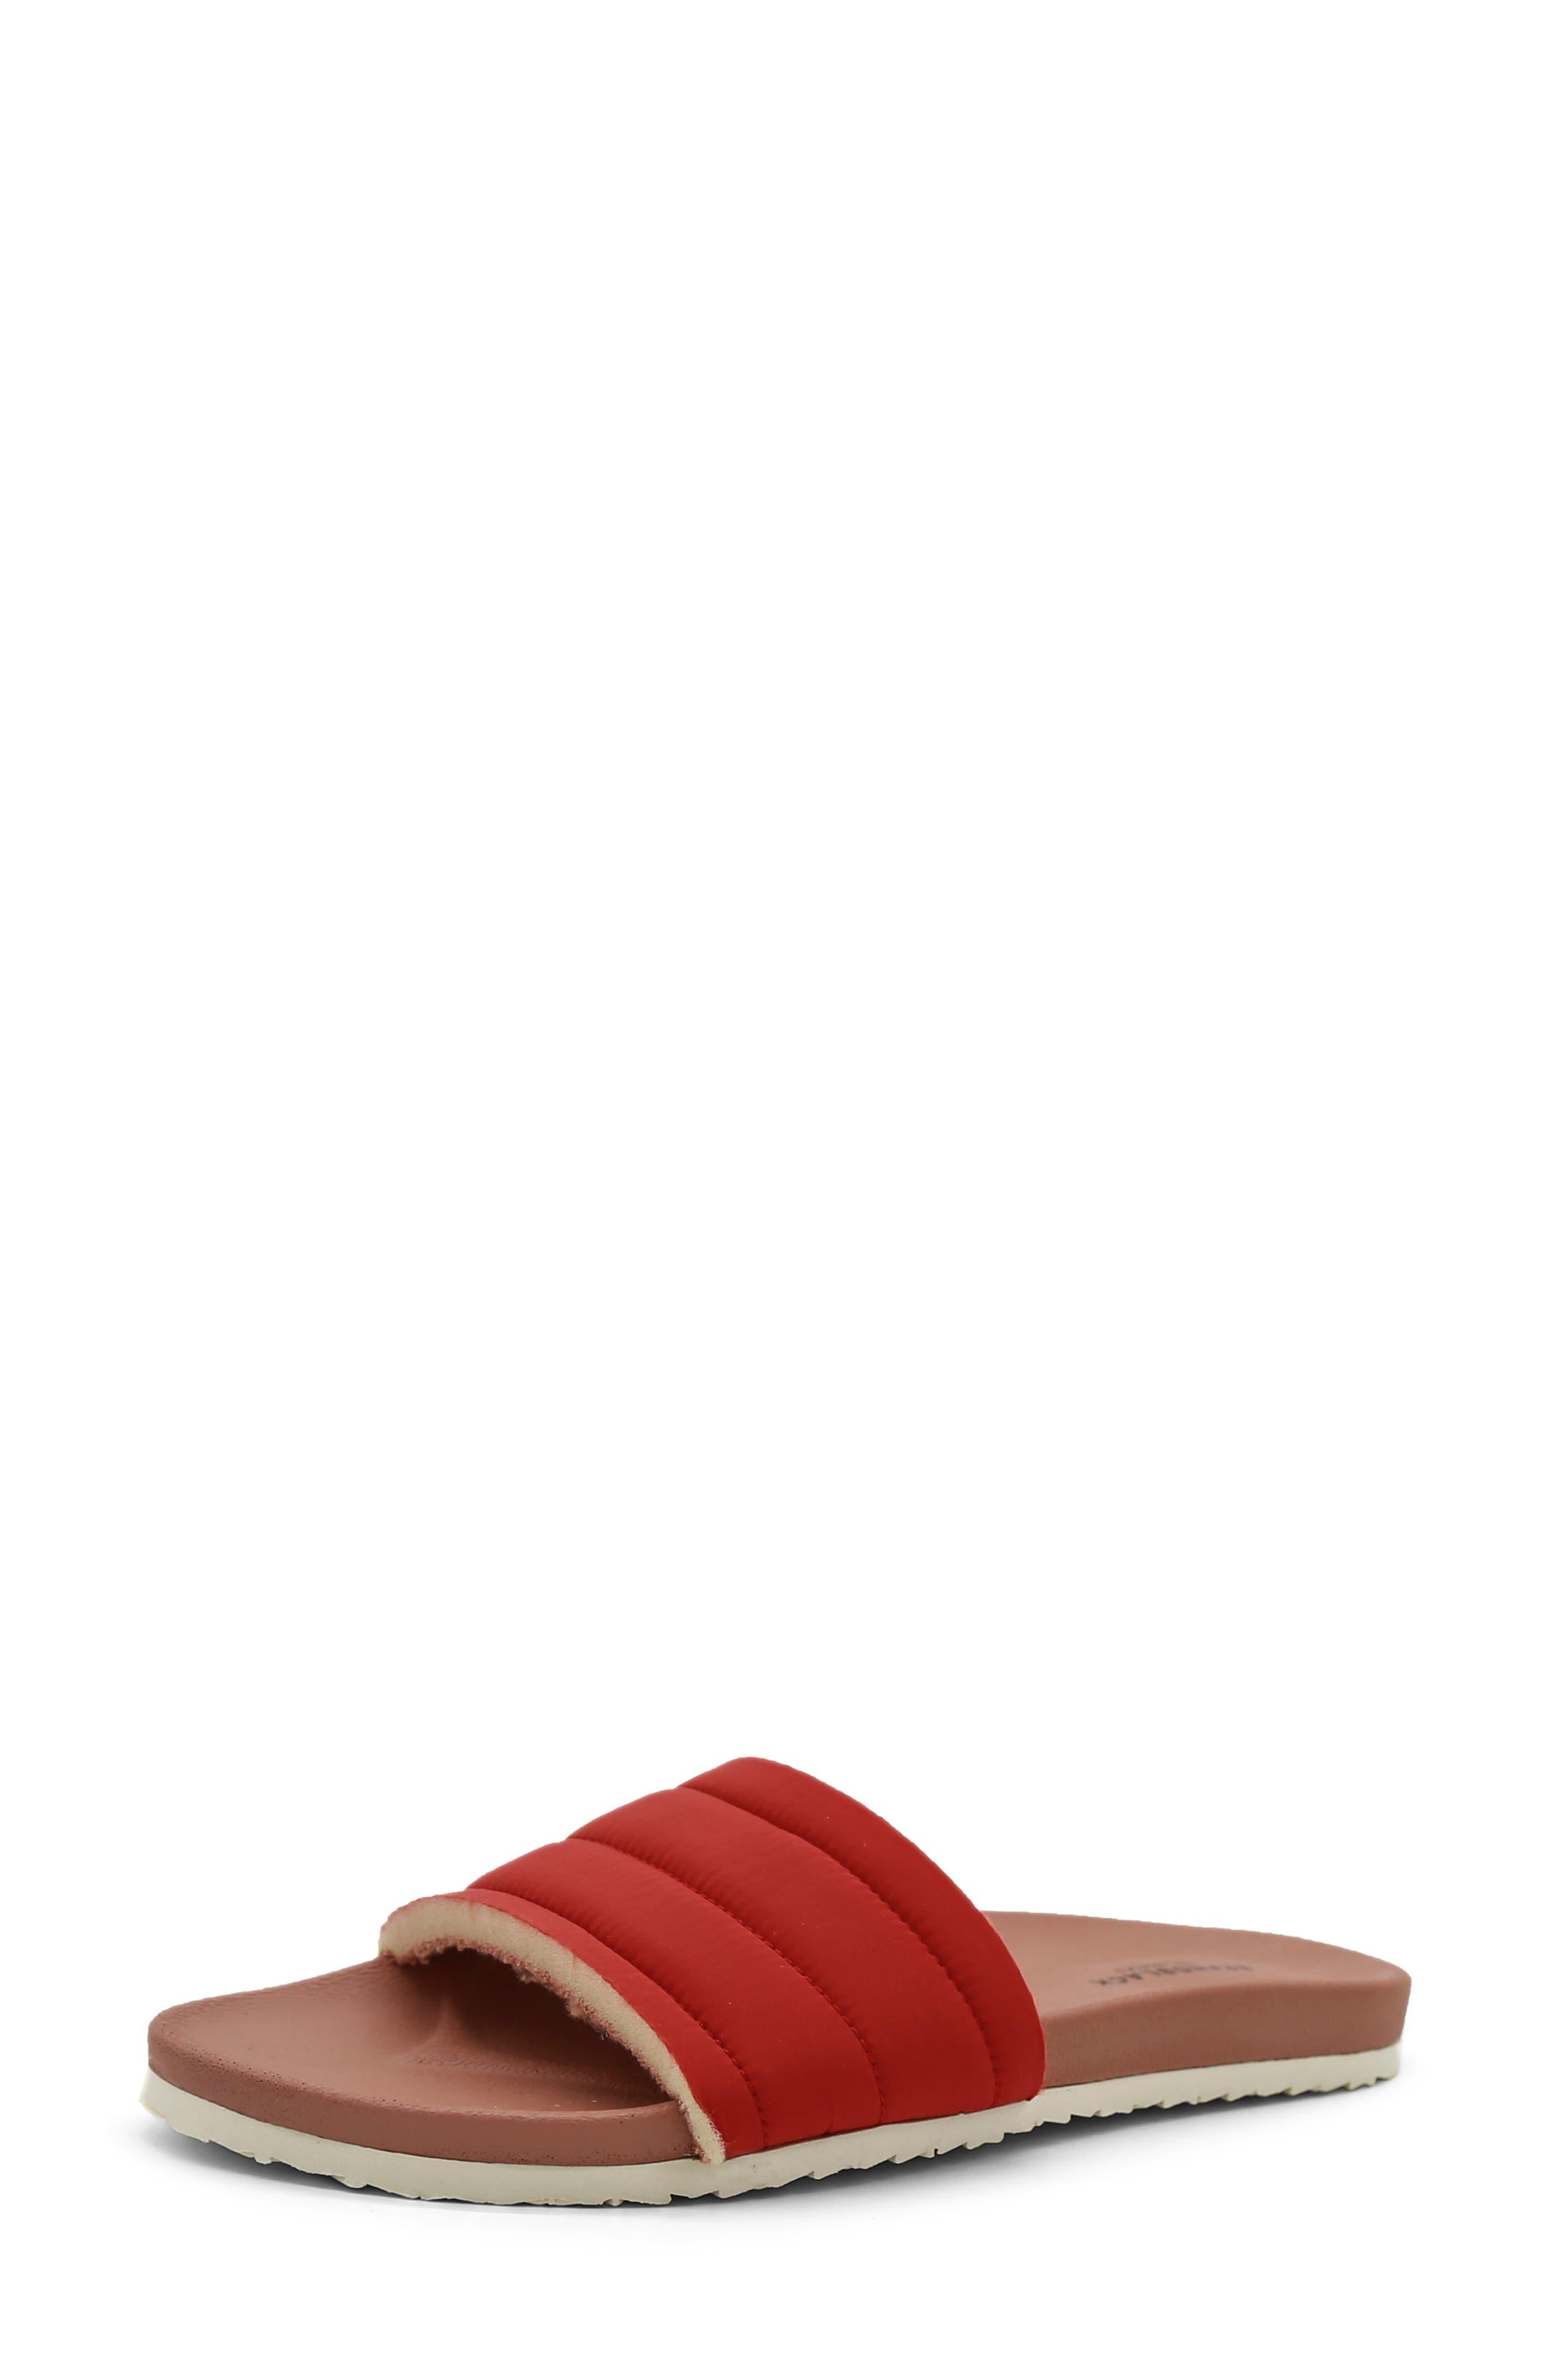 Bonito Slide Sandal